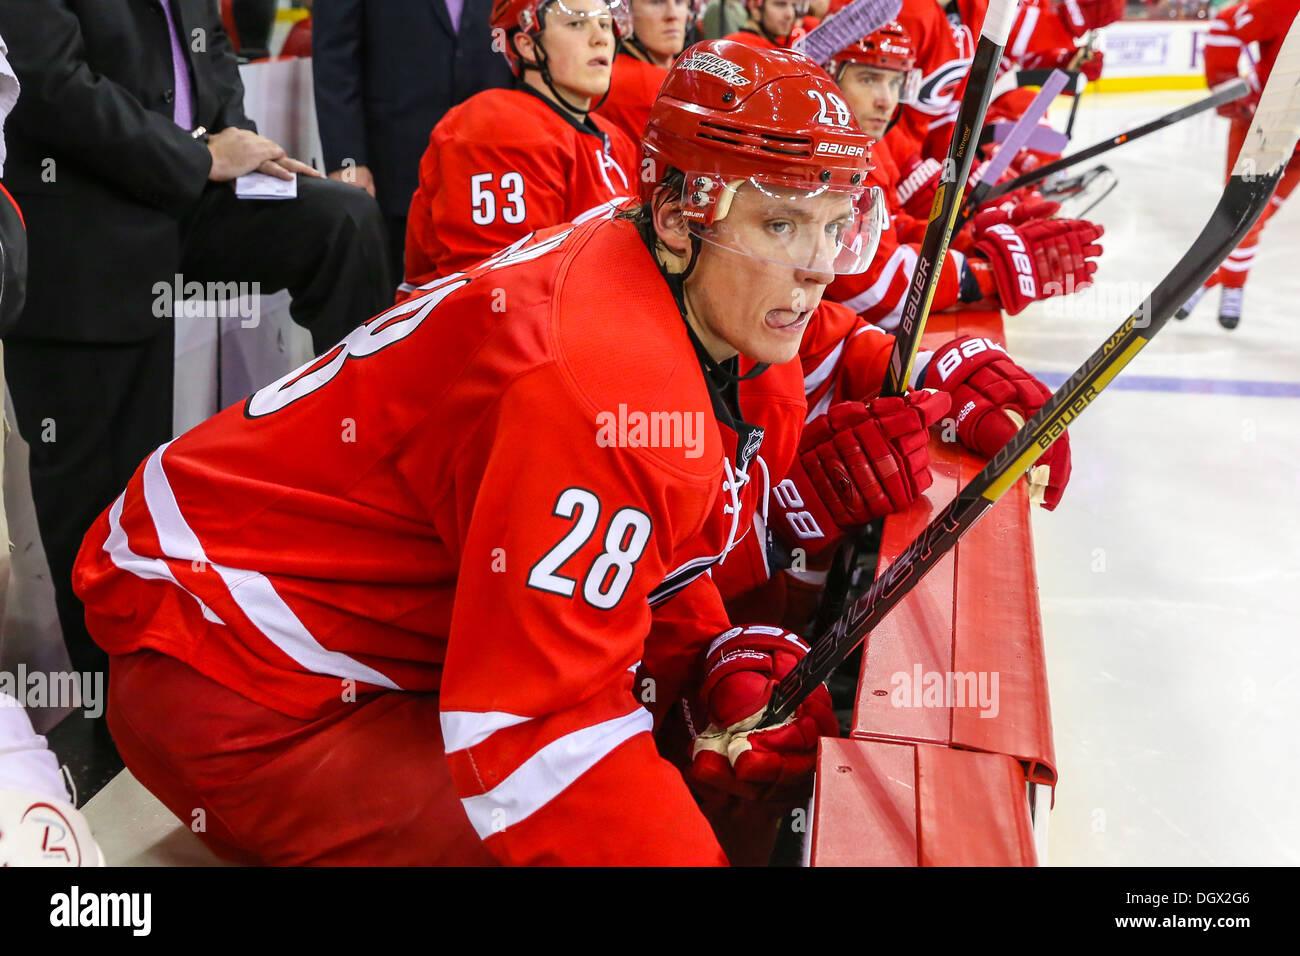 Carolina Hurricane Alexander Semin during an NHL hockey game during the 2013-2014 season - Stock Image